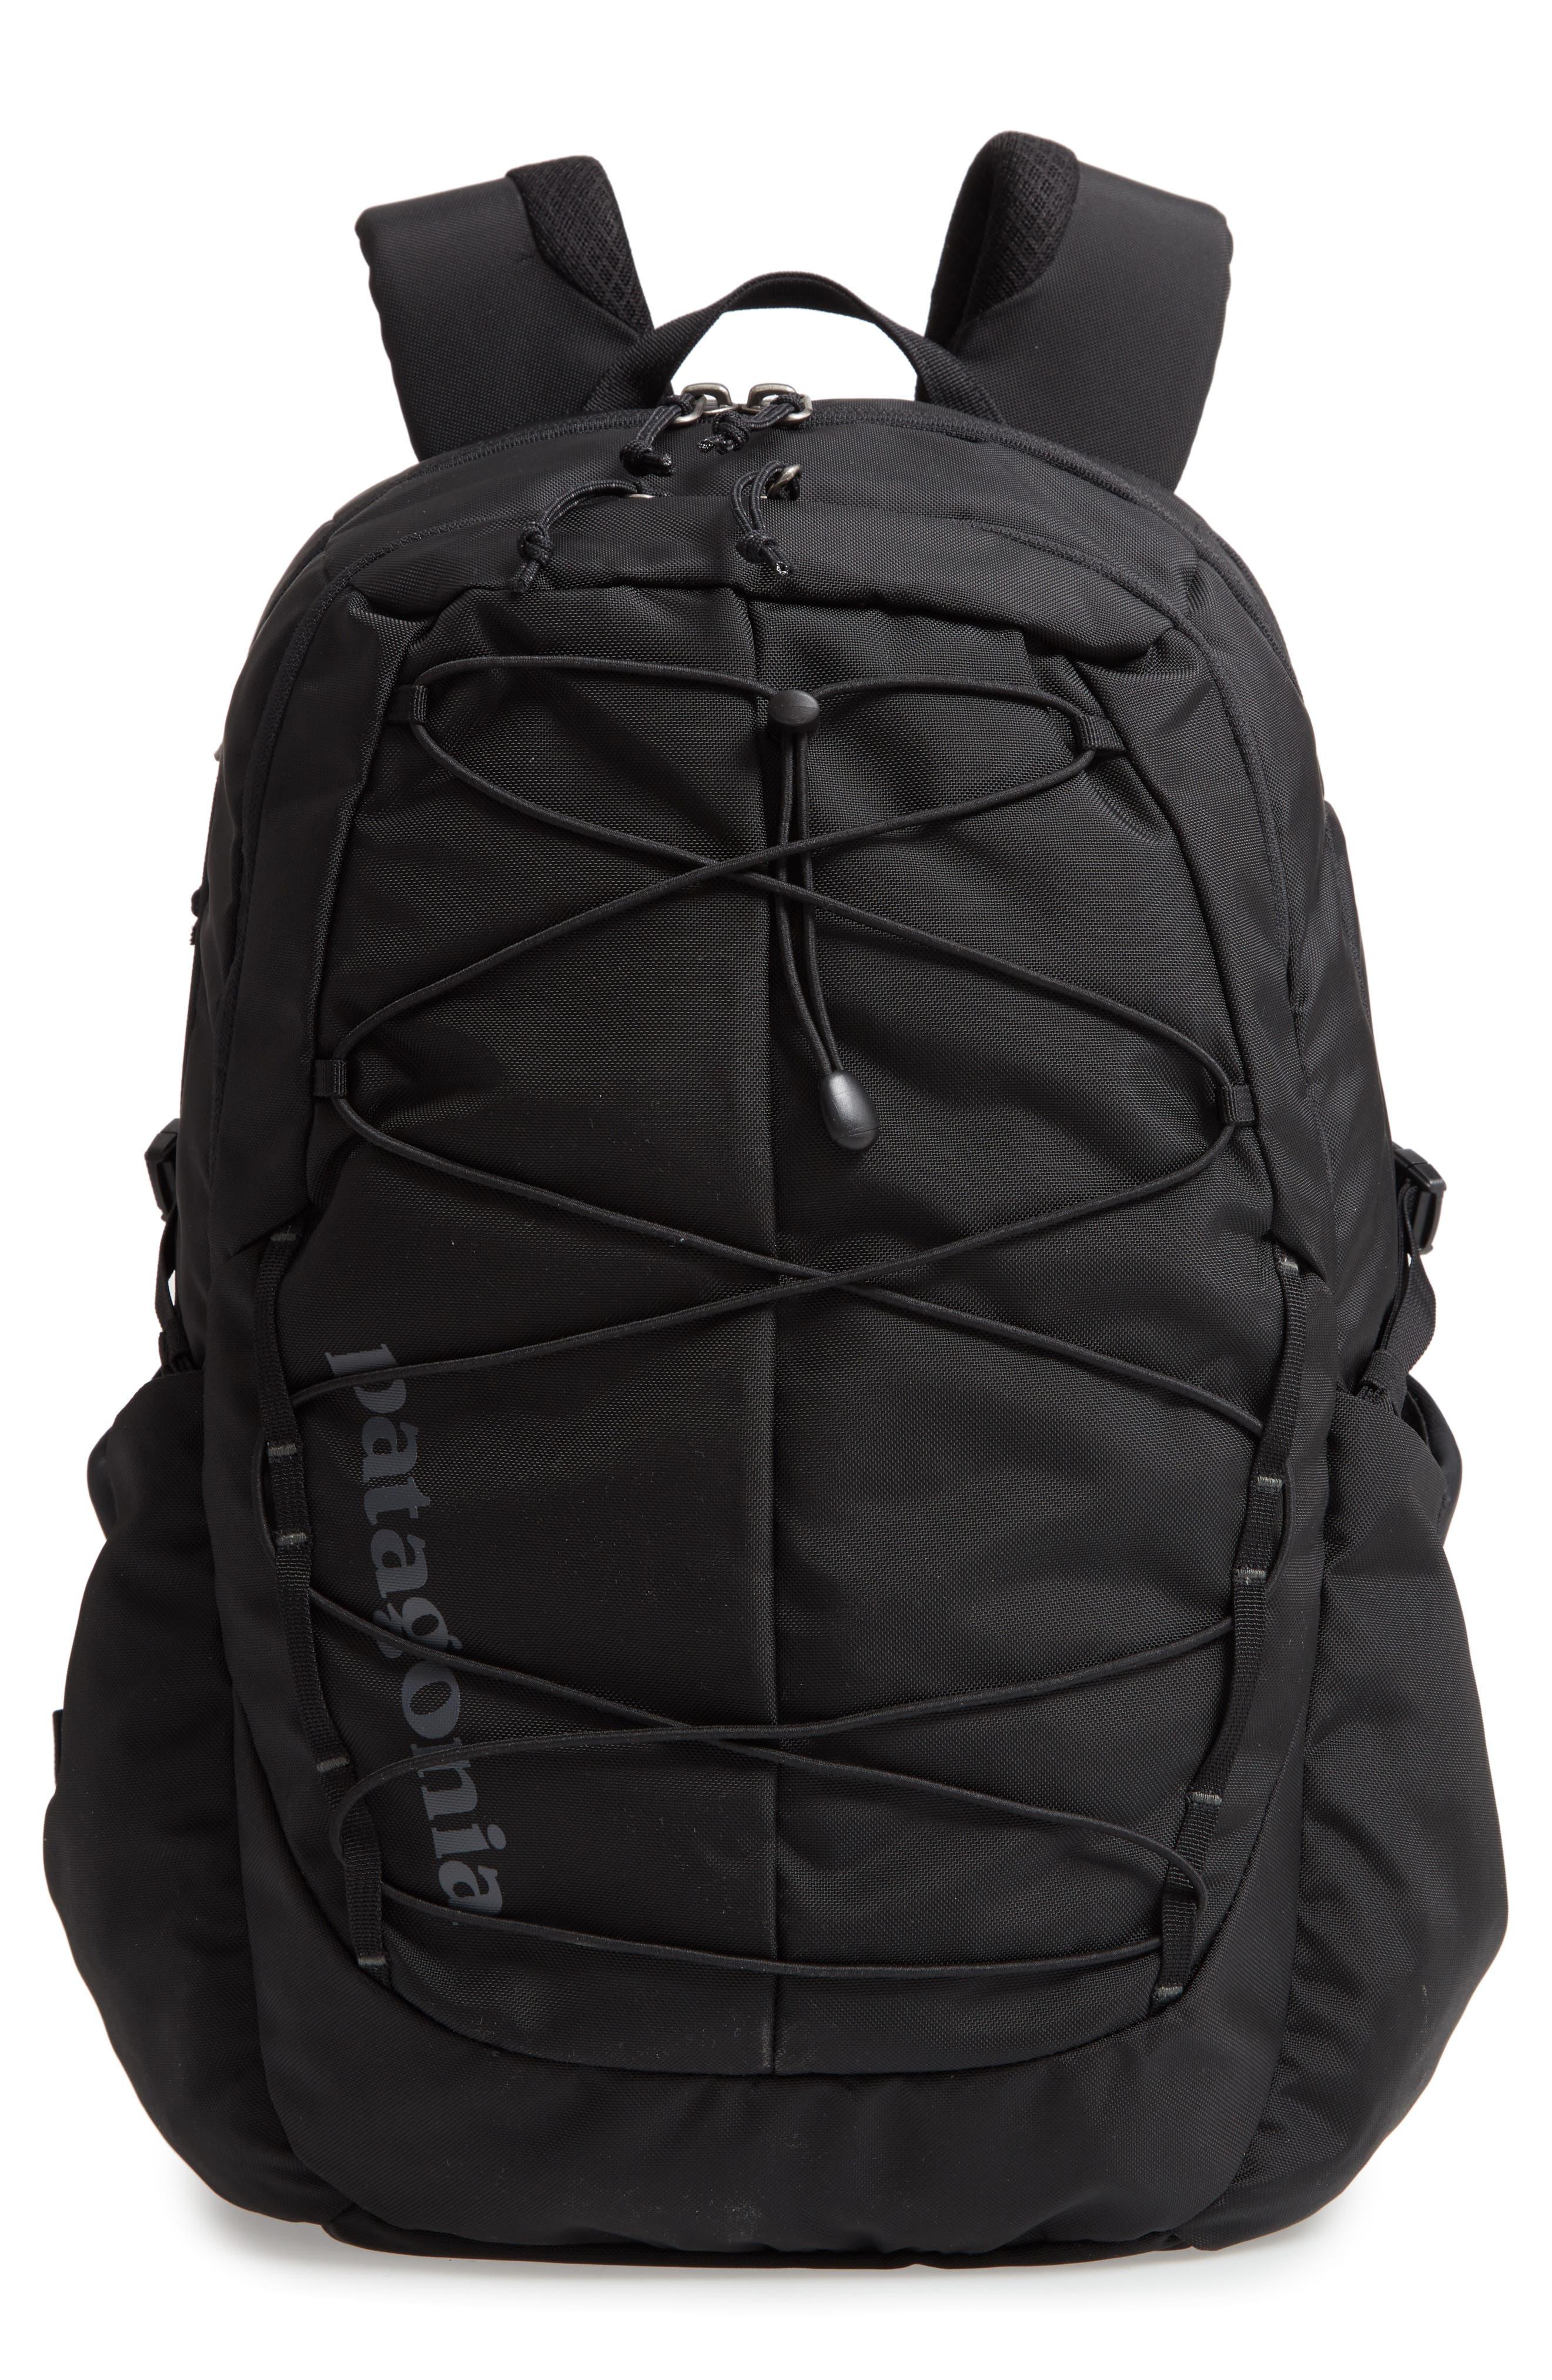 PATAGONIA, 28L Chacabuco Backpack, Main thumbnail 1, color, 001